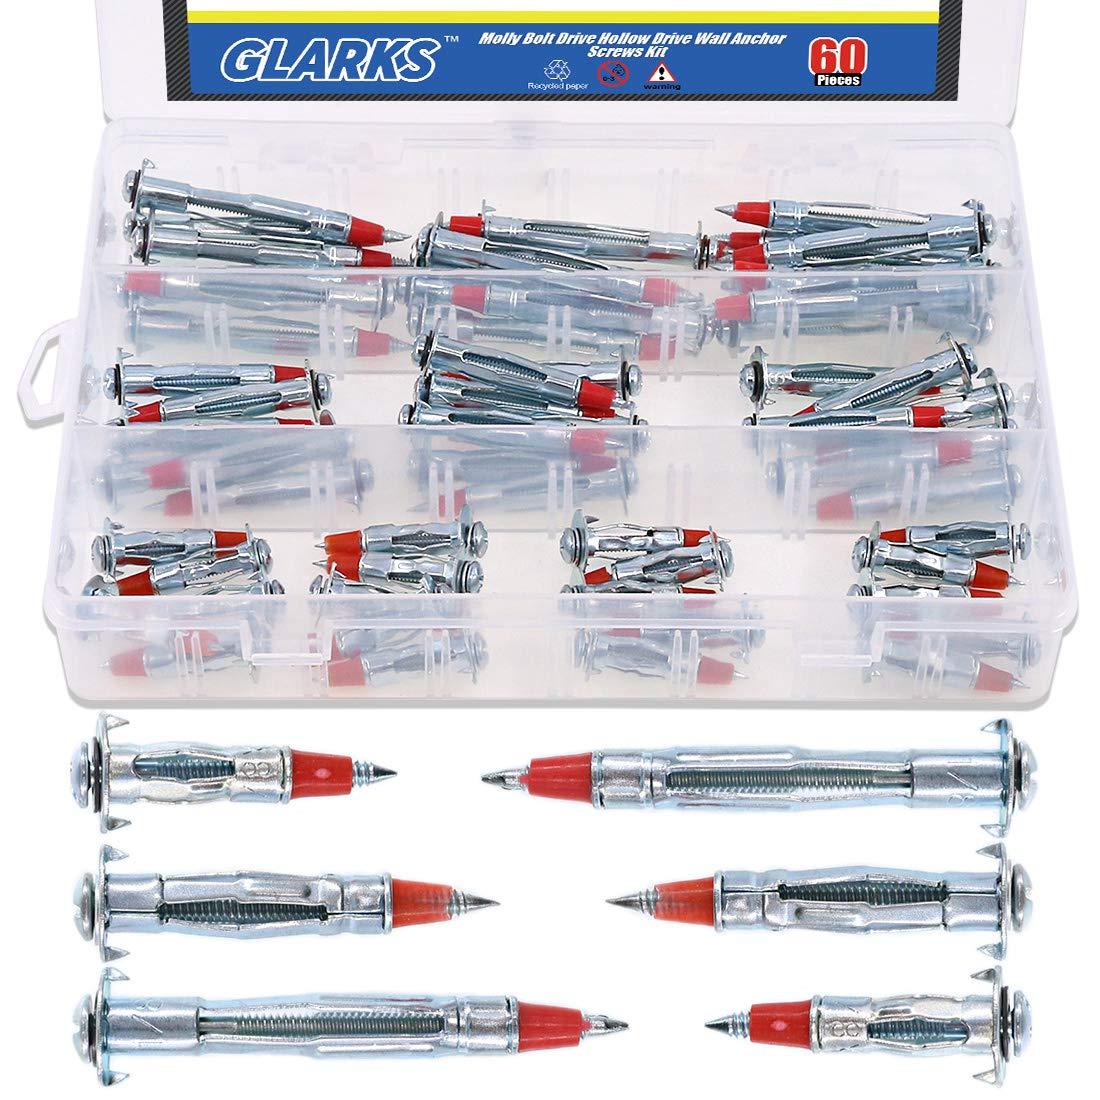 Glarks 60Pcs Heavy Duty 1/8 inch 35/46/59mm Zinc Plated Steel Molly Bolt Drive Hollow Drive Wall Anchor Screws Assortment Kit